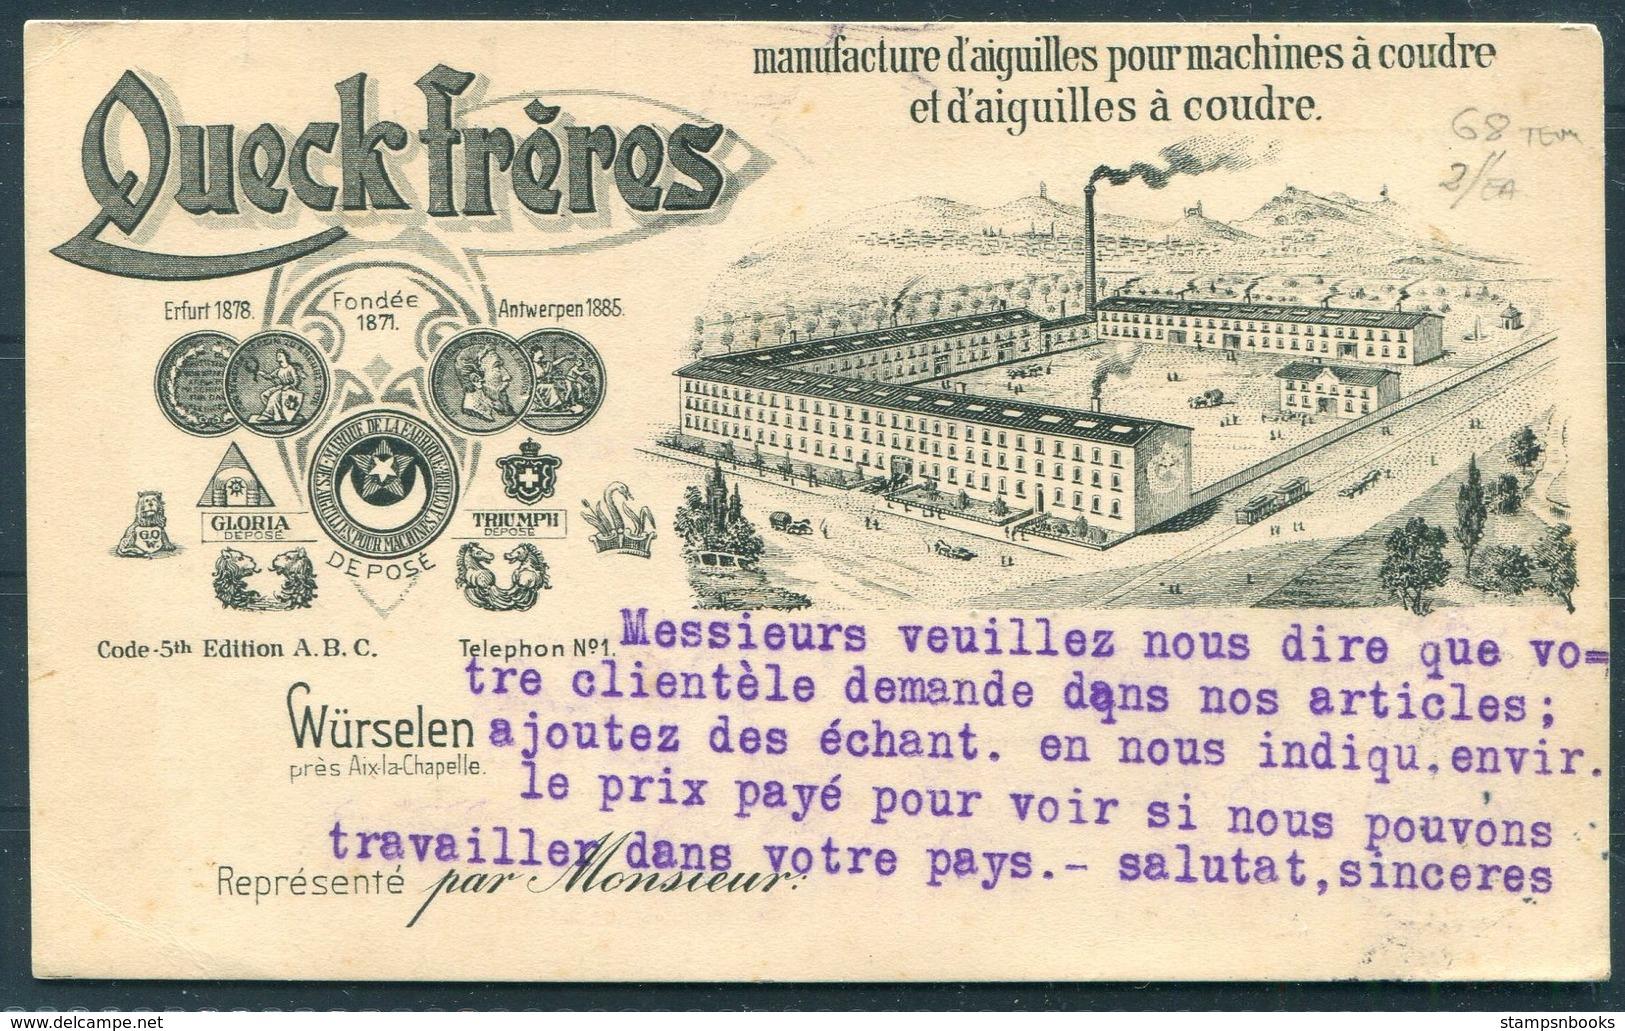 1914 Germany Queck Freres Illustrated Advertising Postcard Wurselen - Patras Greece - Deutschland